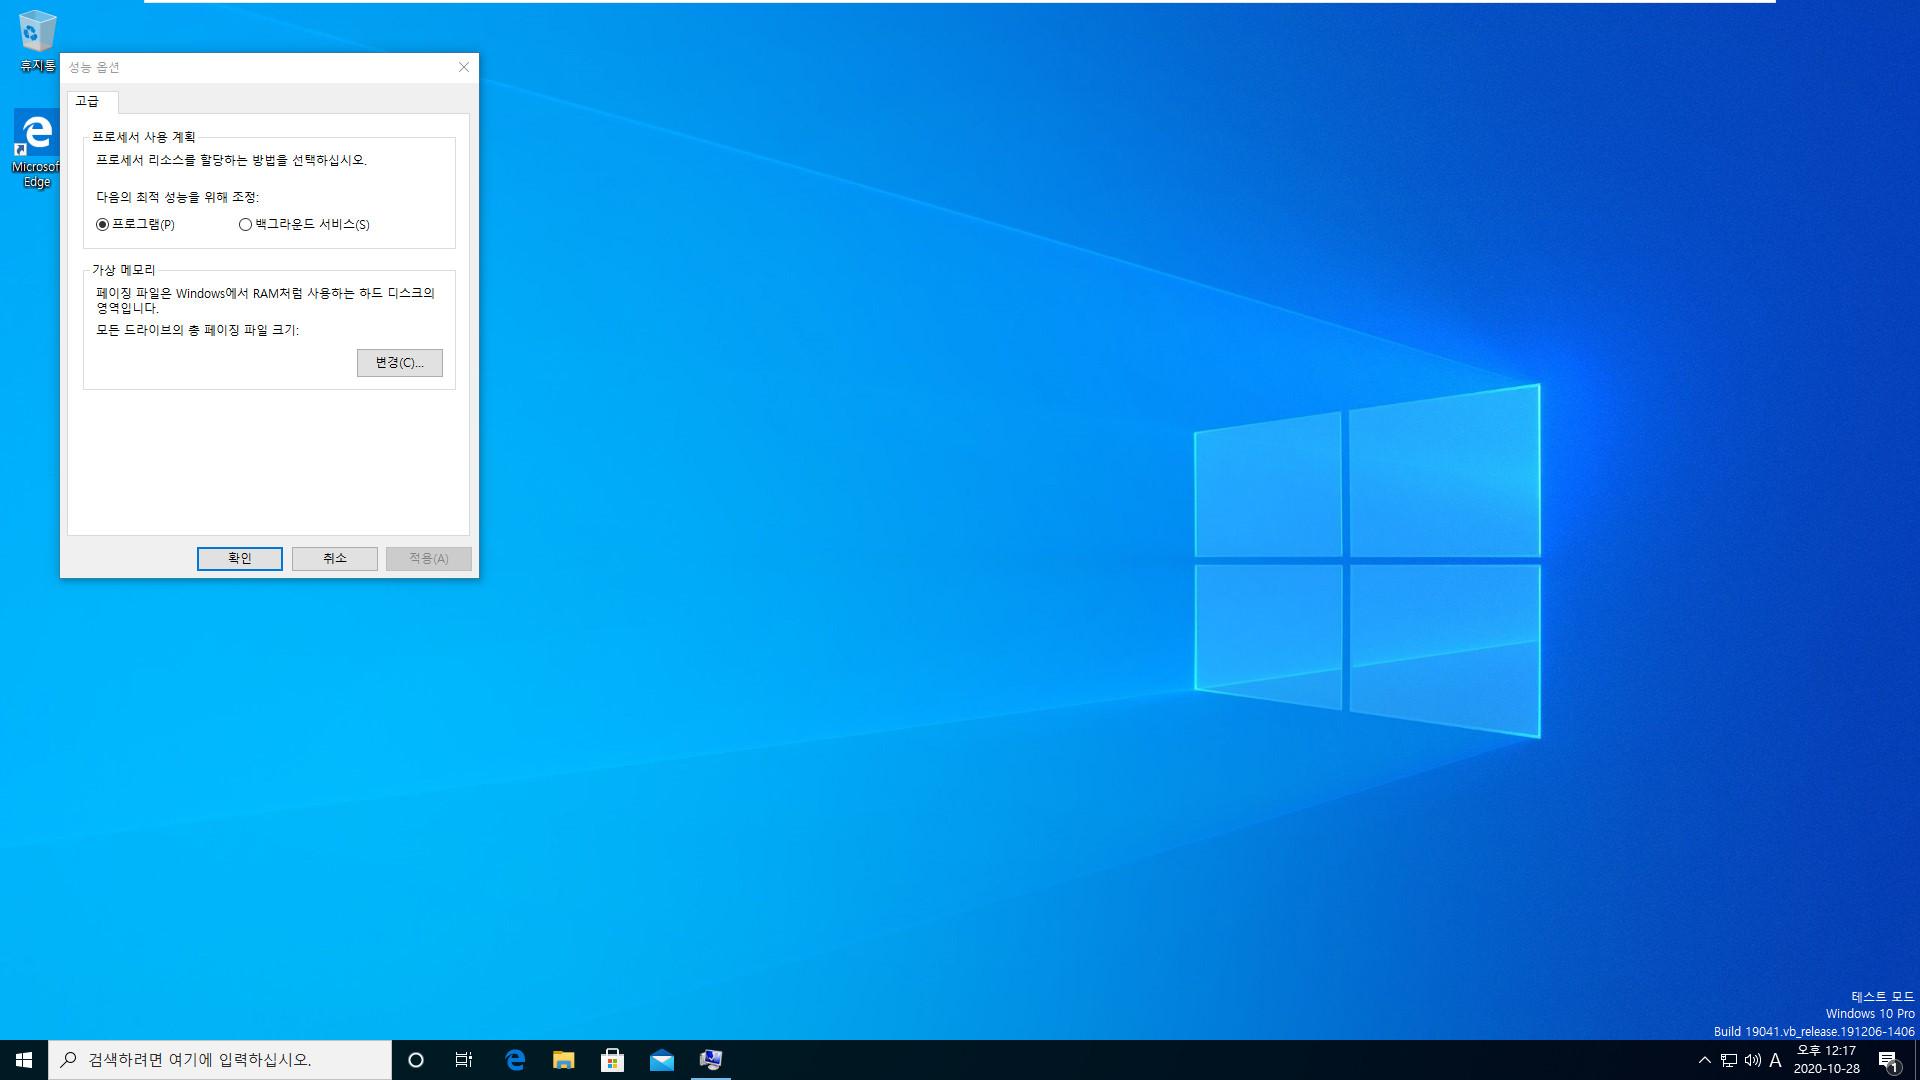 exFAT 포맷으로도 VHD 부팅이 Windows 10 버전 1903부터 된다고 하여 테스트 - 다시 윈도우 설치 boot.wim에서 작업하니까 속도가 전보다는 빠르네요 2020-10-28_121726.jpg